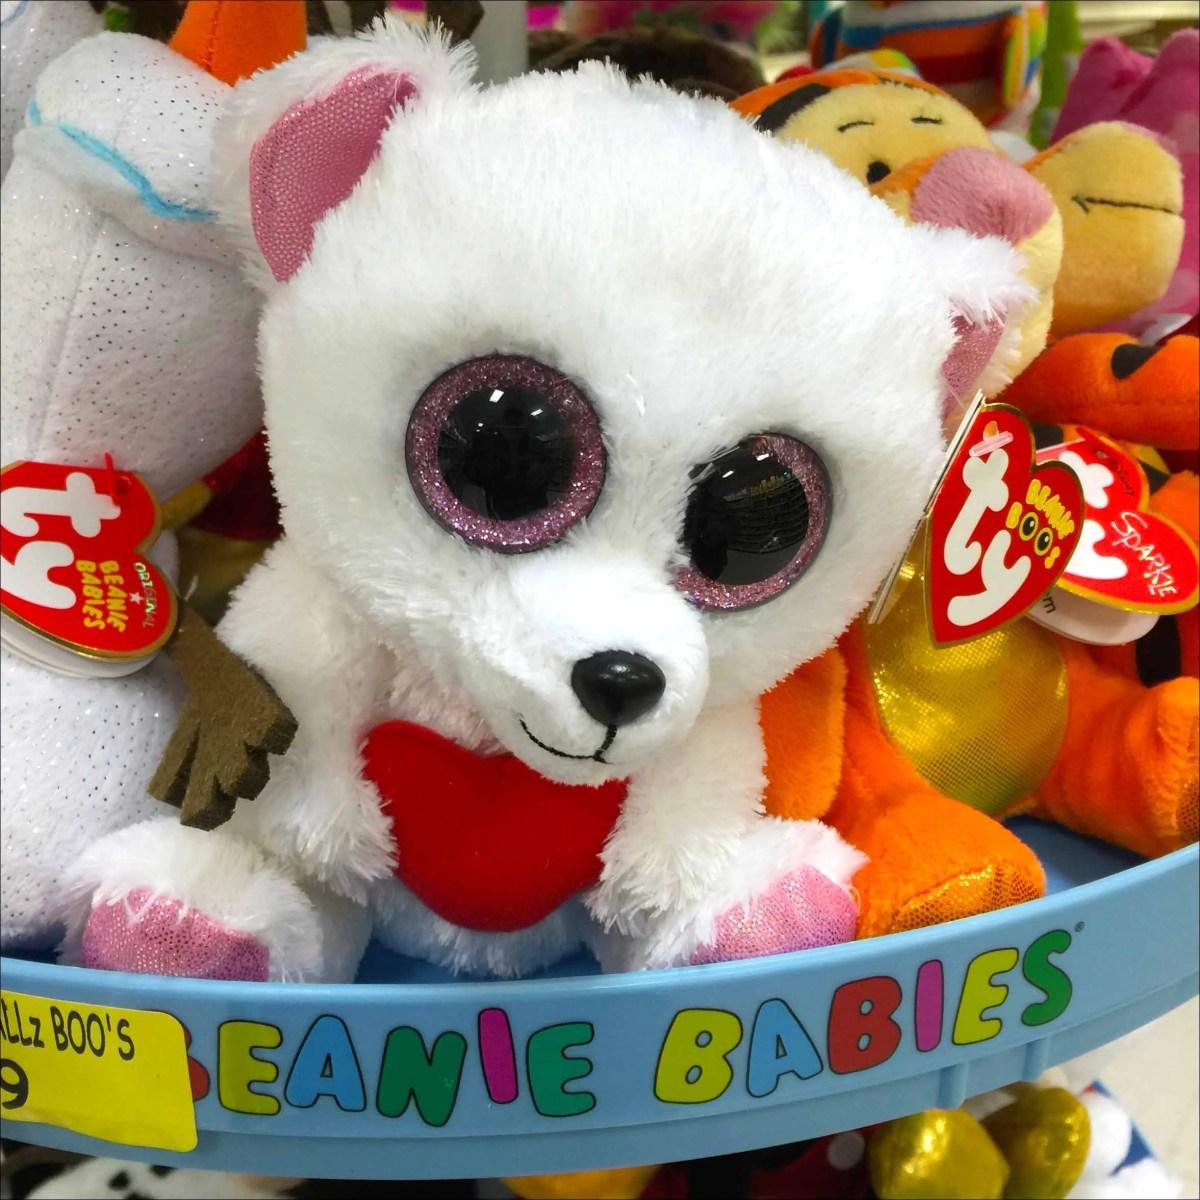 Beanie Baby Branding Above and Below